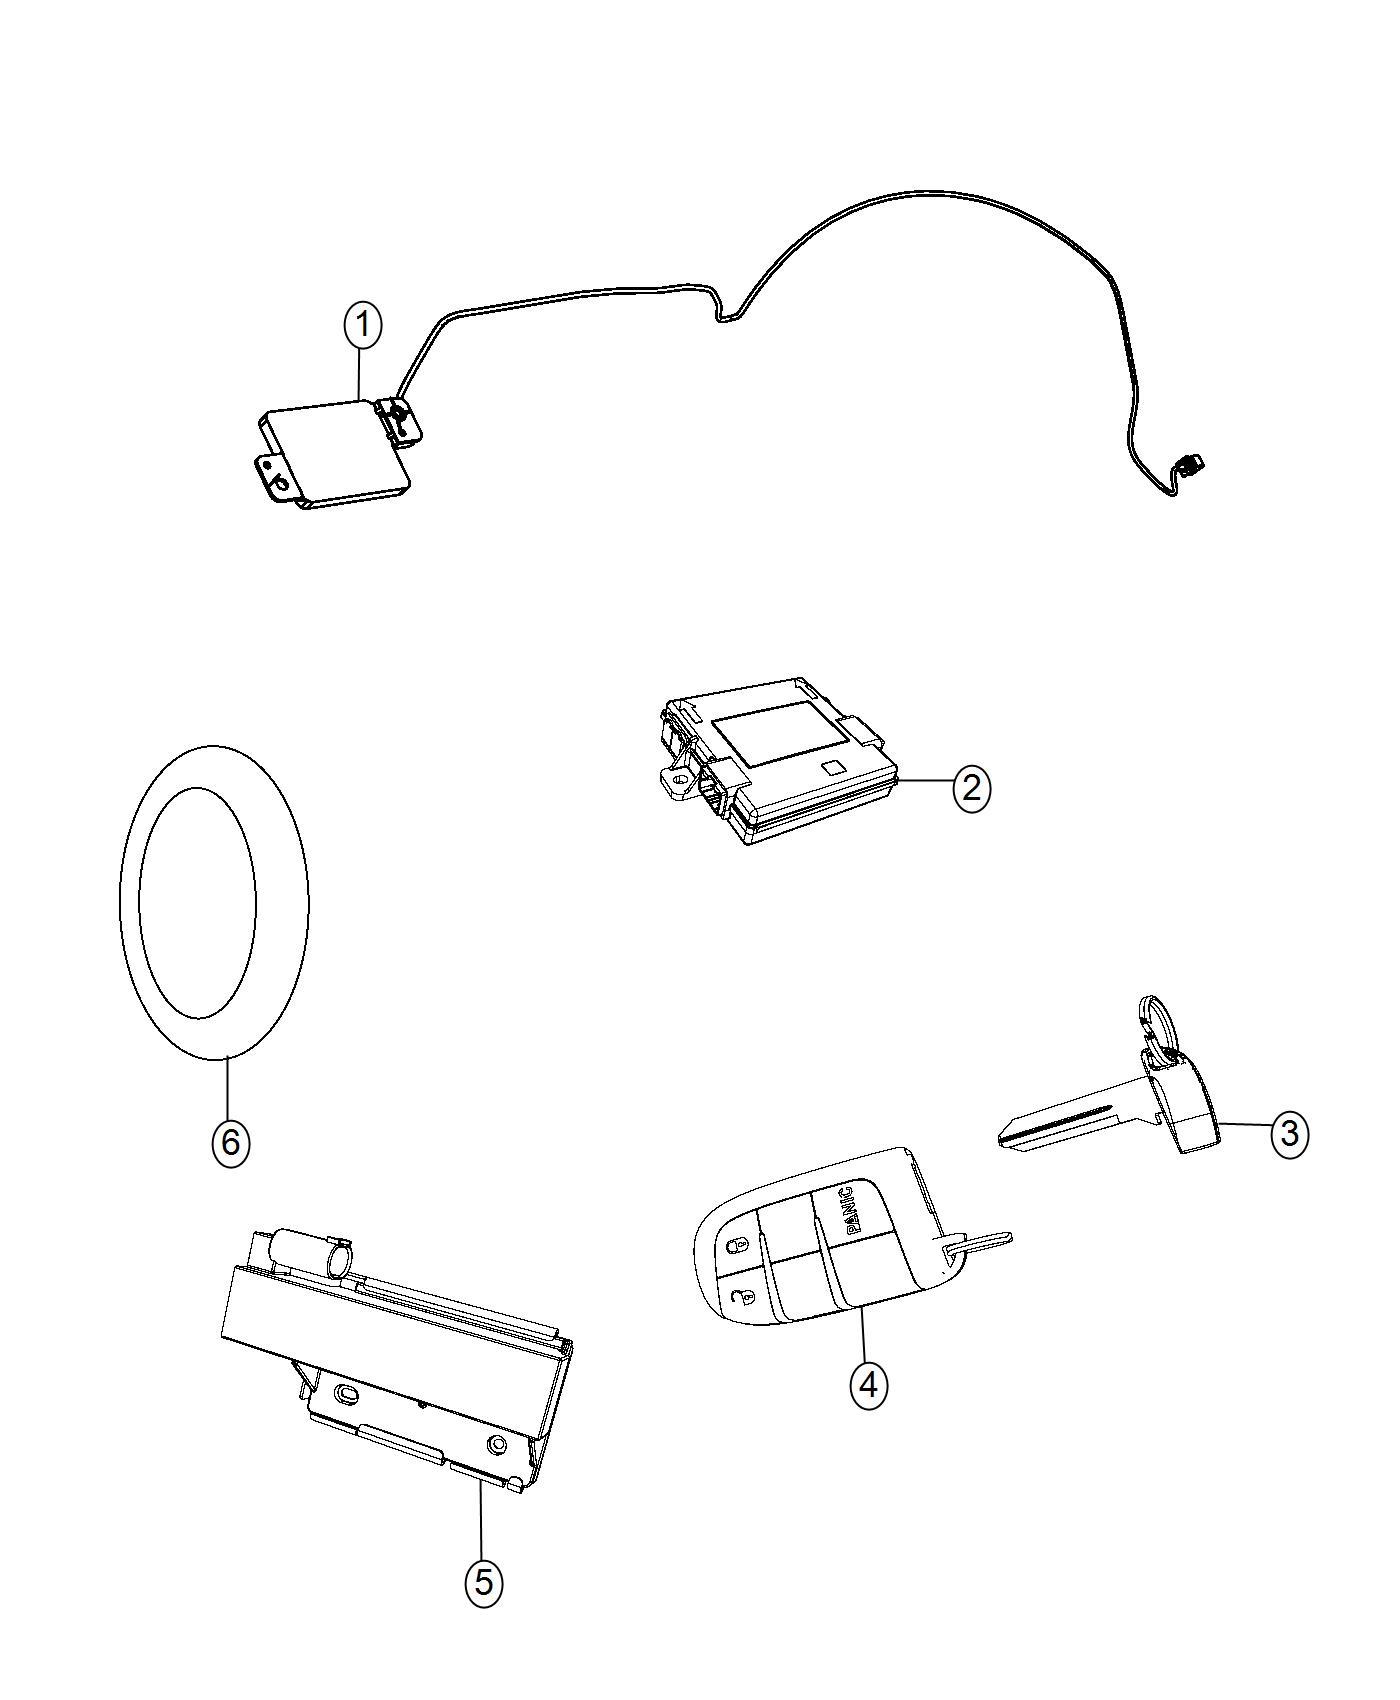 2017 Jeep Grand Cherokee Transmitter. Integrated key fob